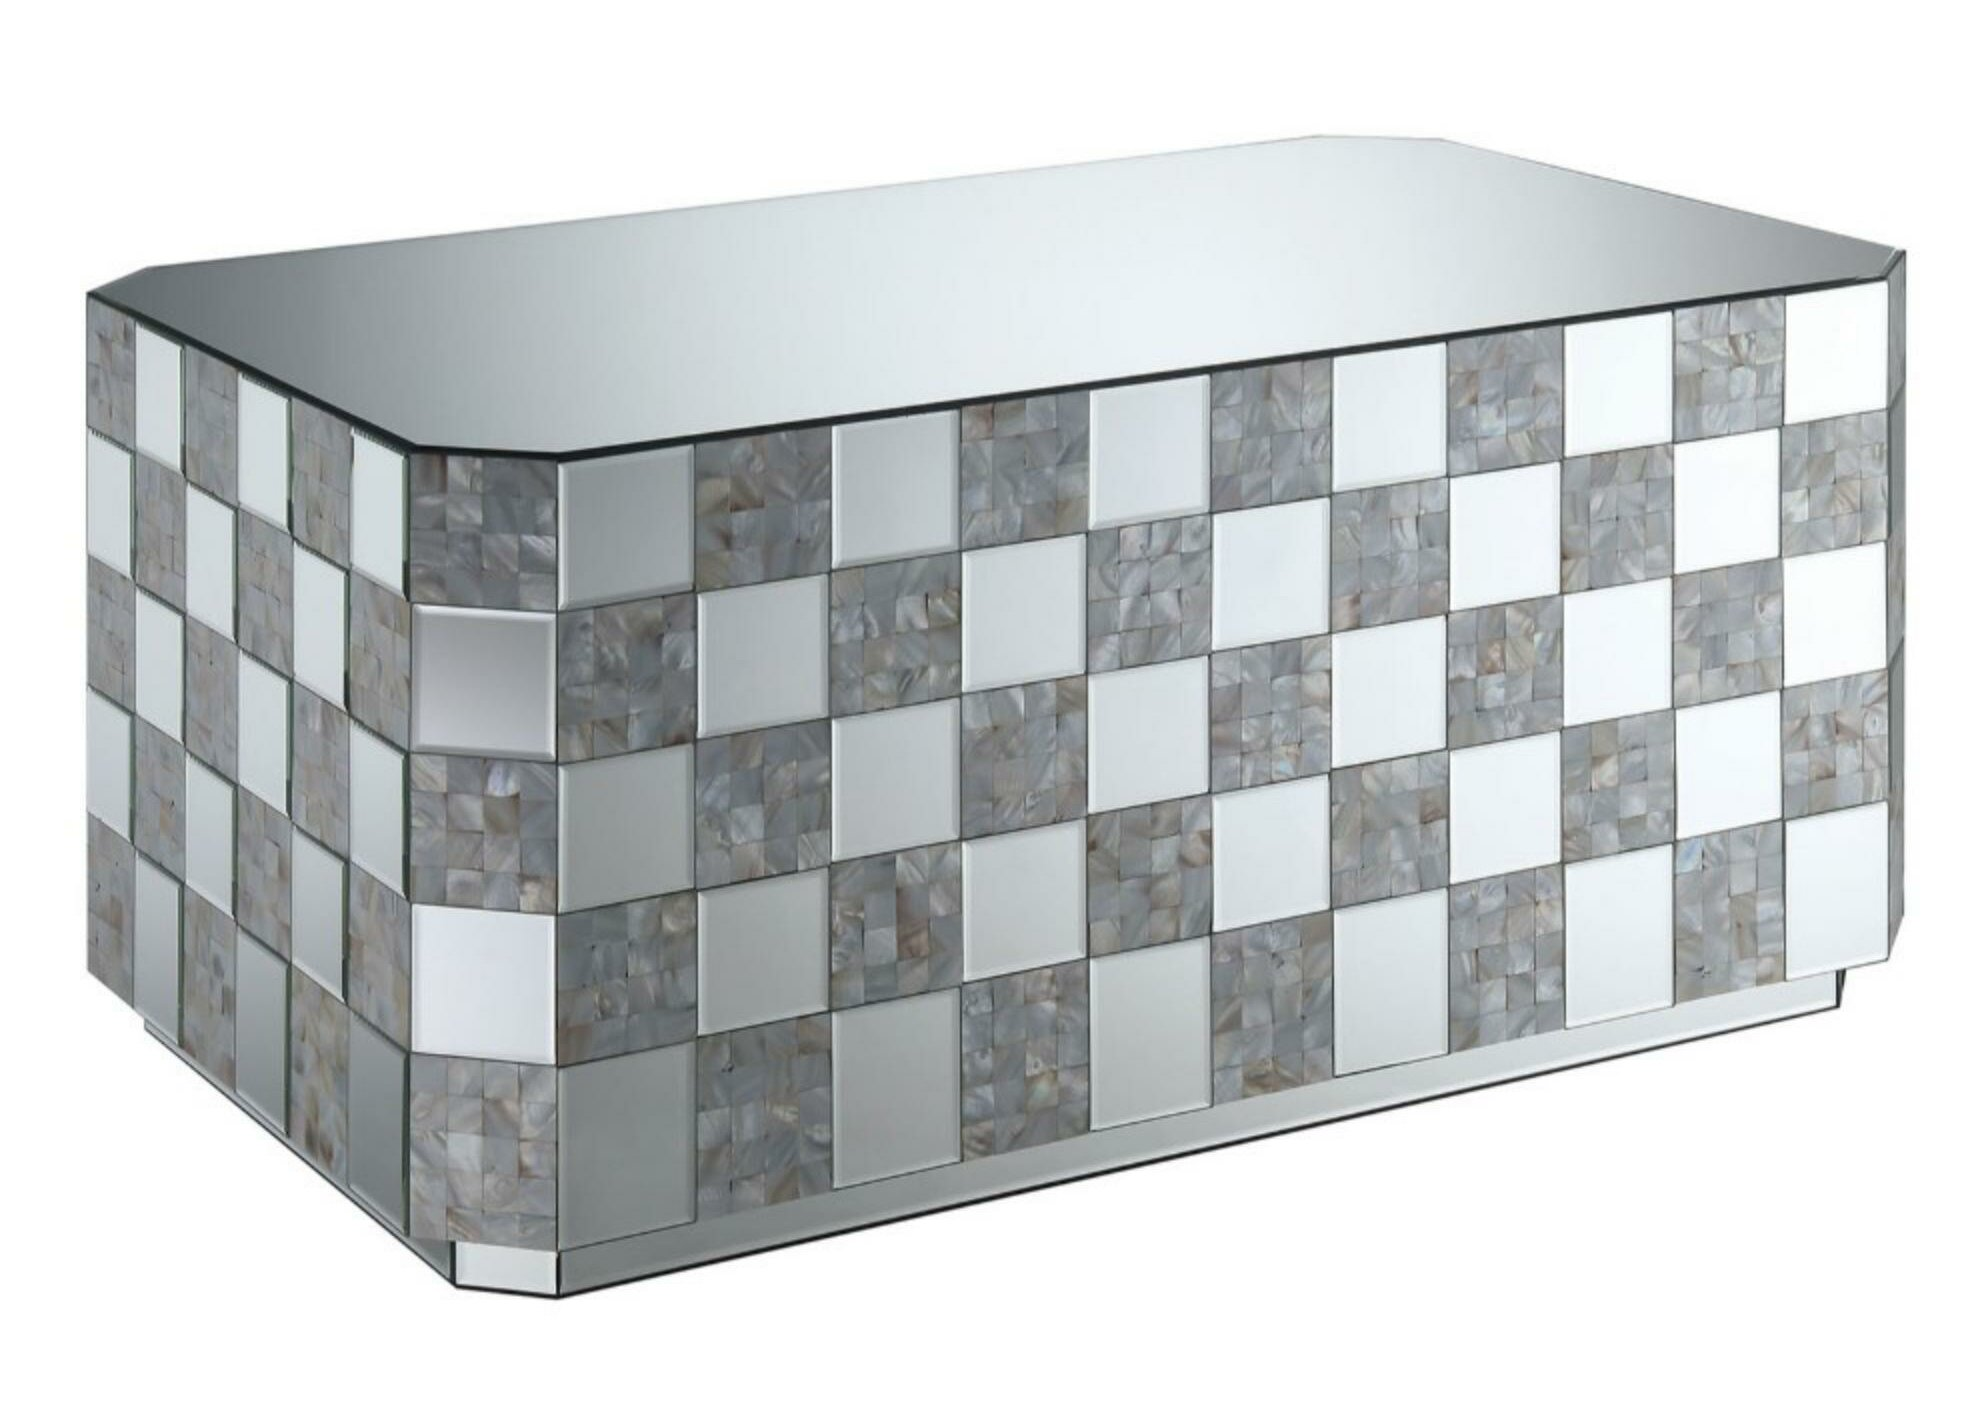 mizpah contemporary mirrored coffee table